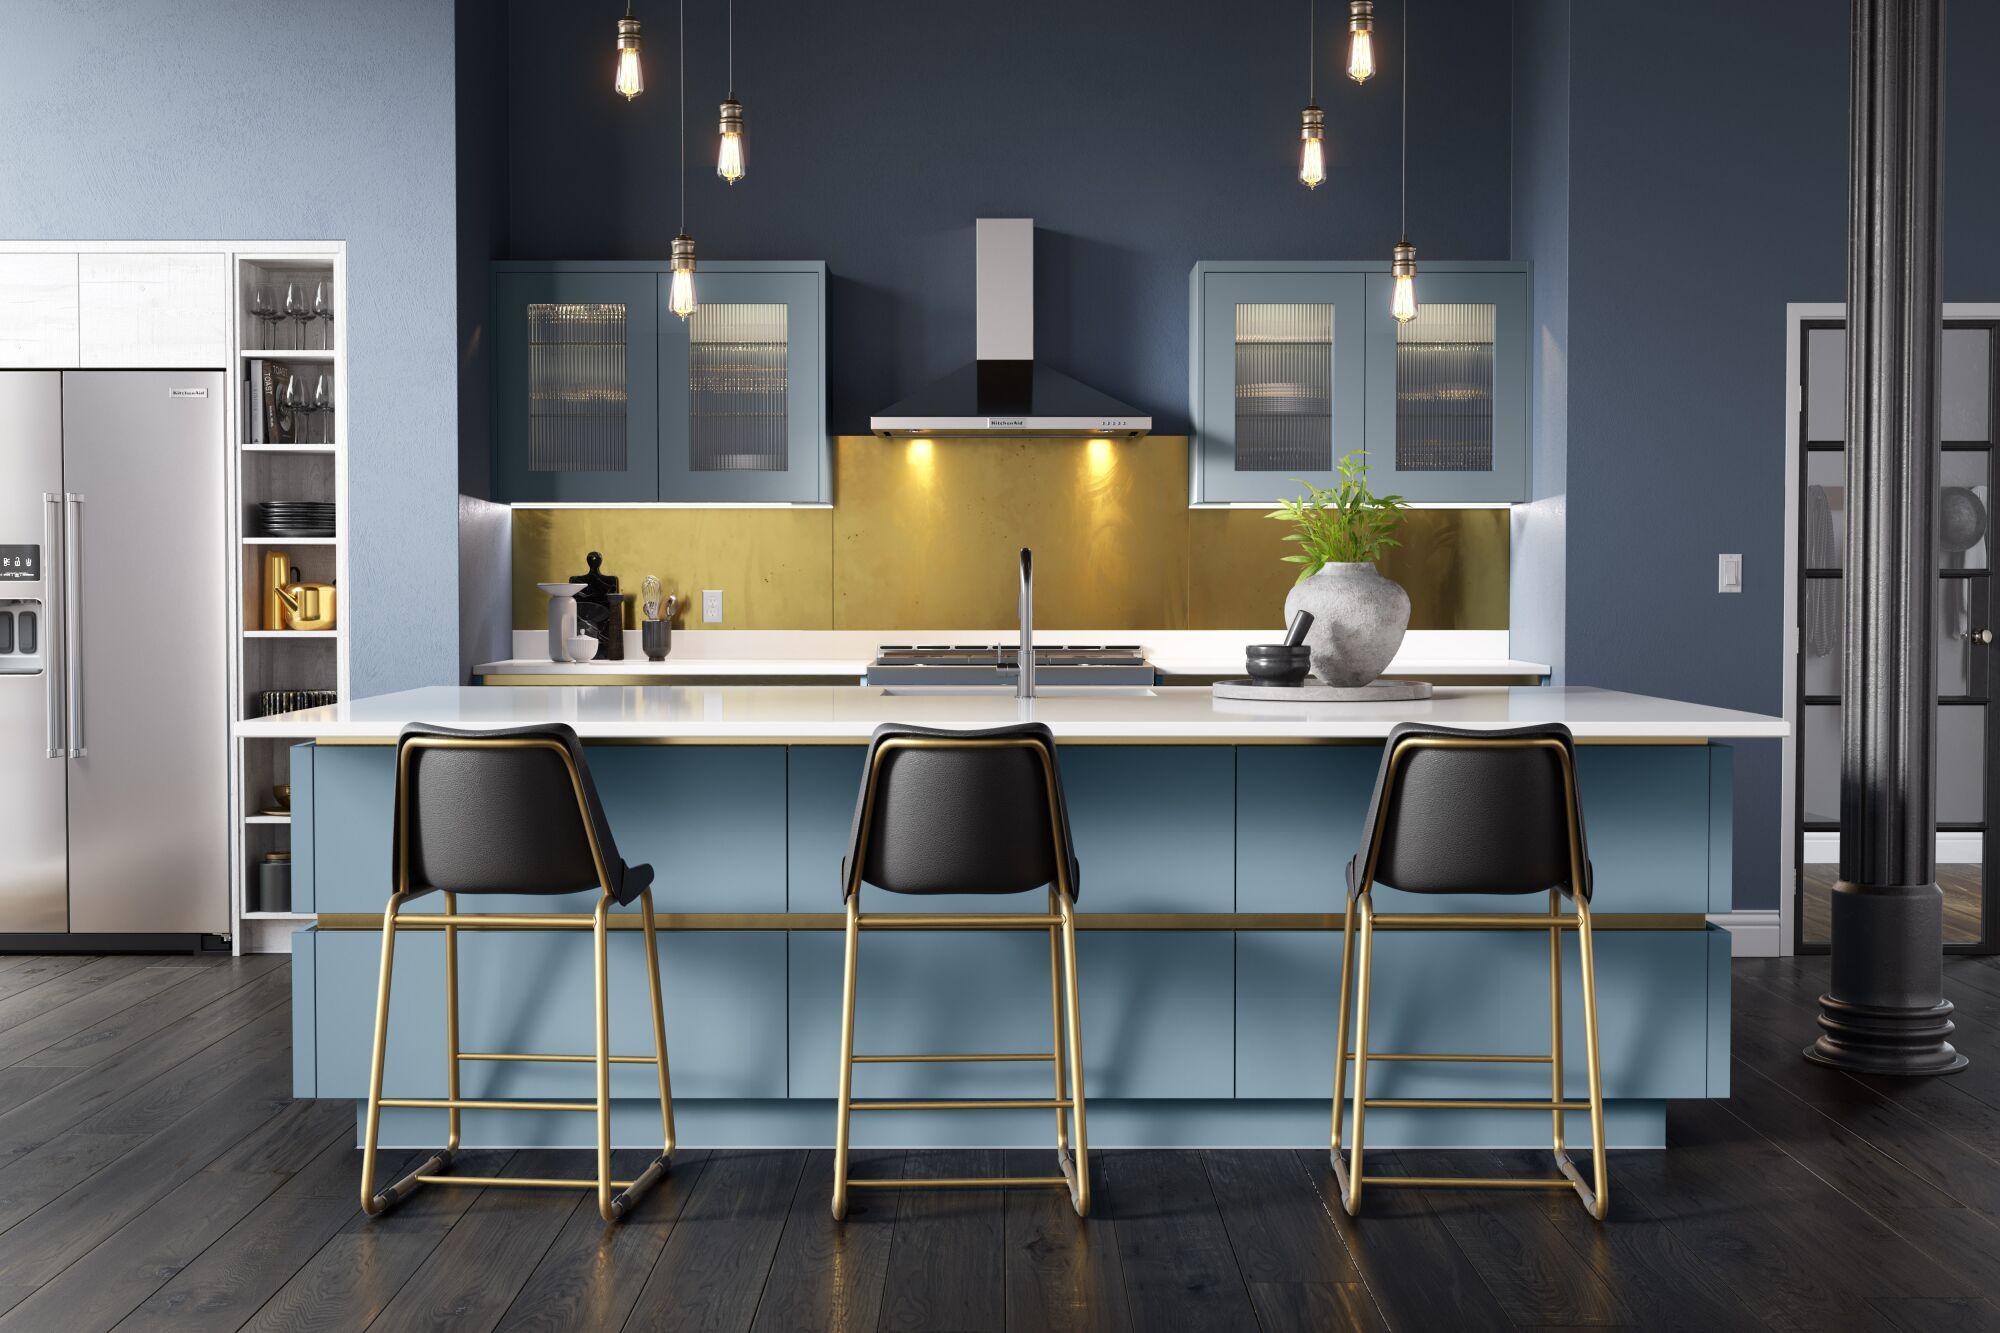 Milano Ultra Kitchen in Smoke Blue